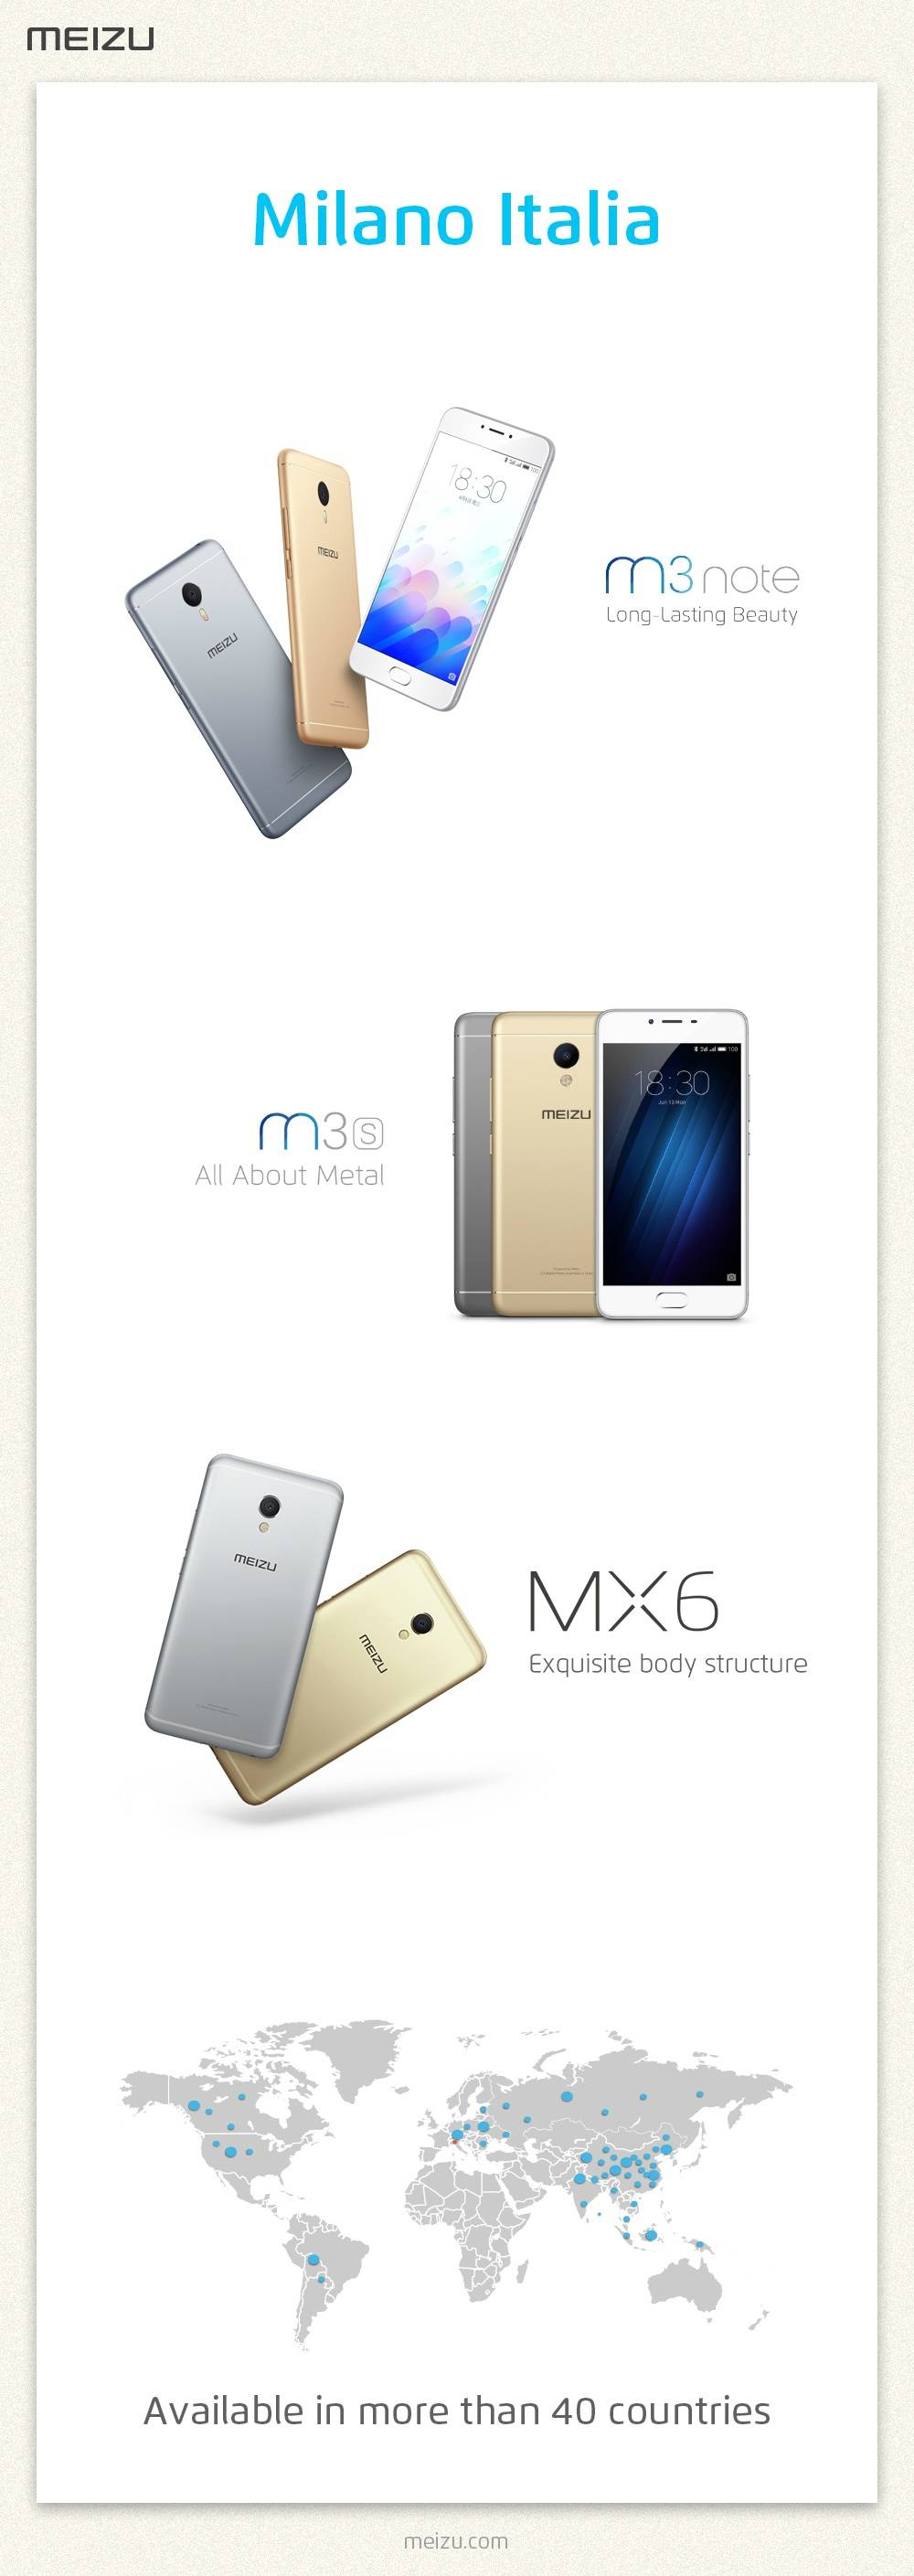 Meizuがイタリアのスマートフォン市場にMeizu M3 note、Meizu M3s、Meizu MX6を投入